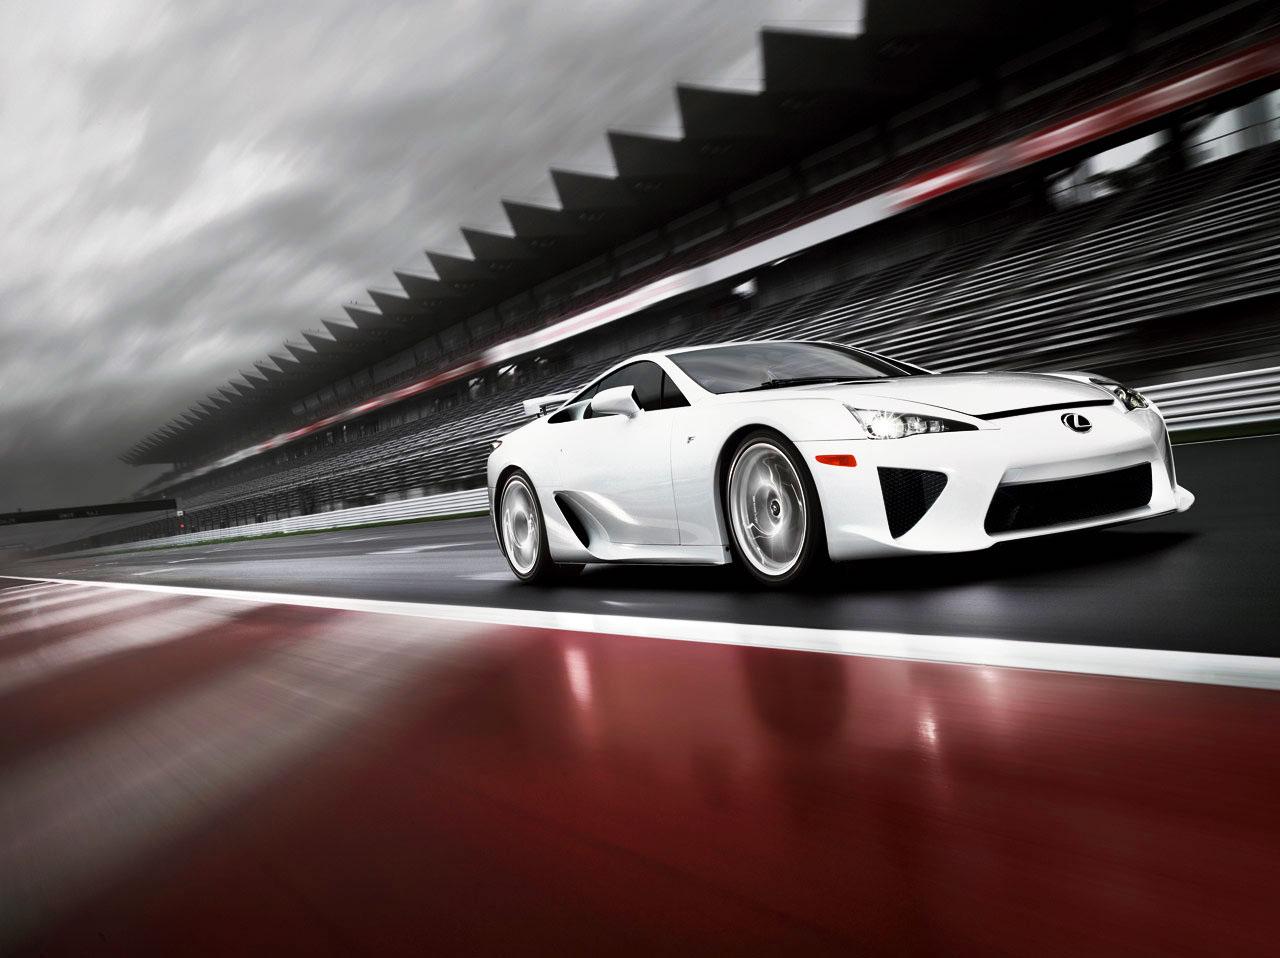 The Lexus LFA Supercar is